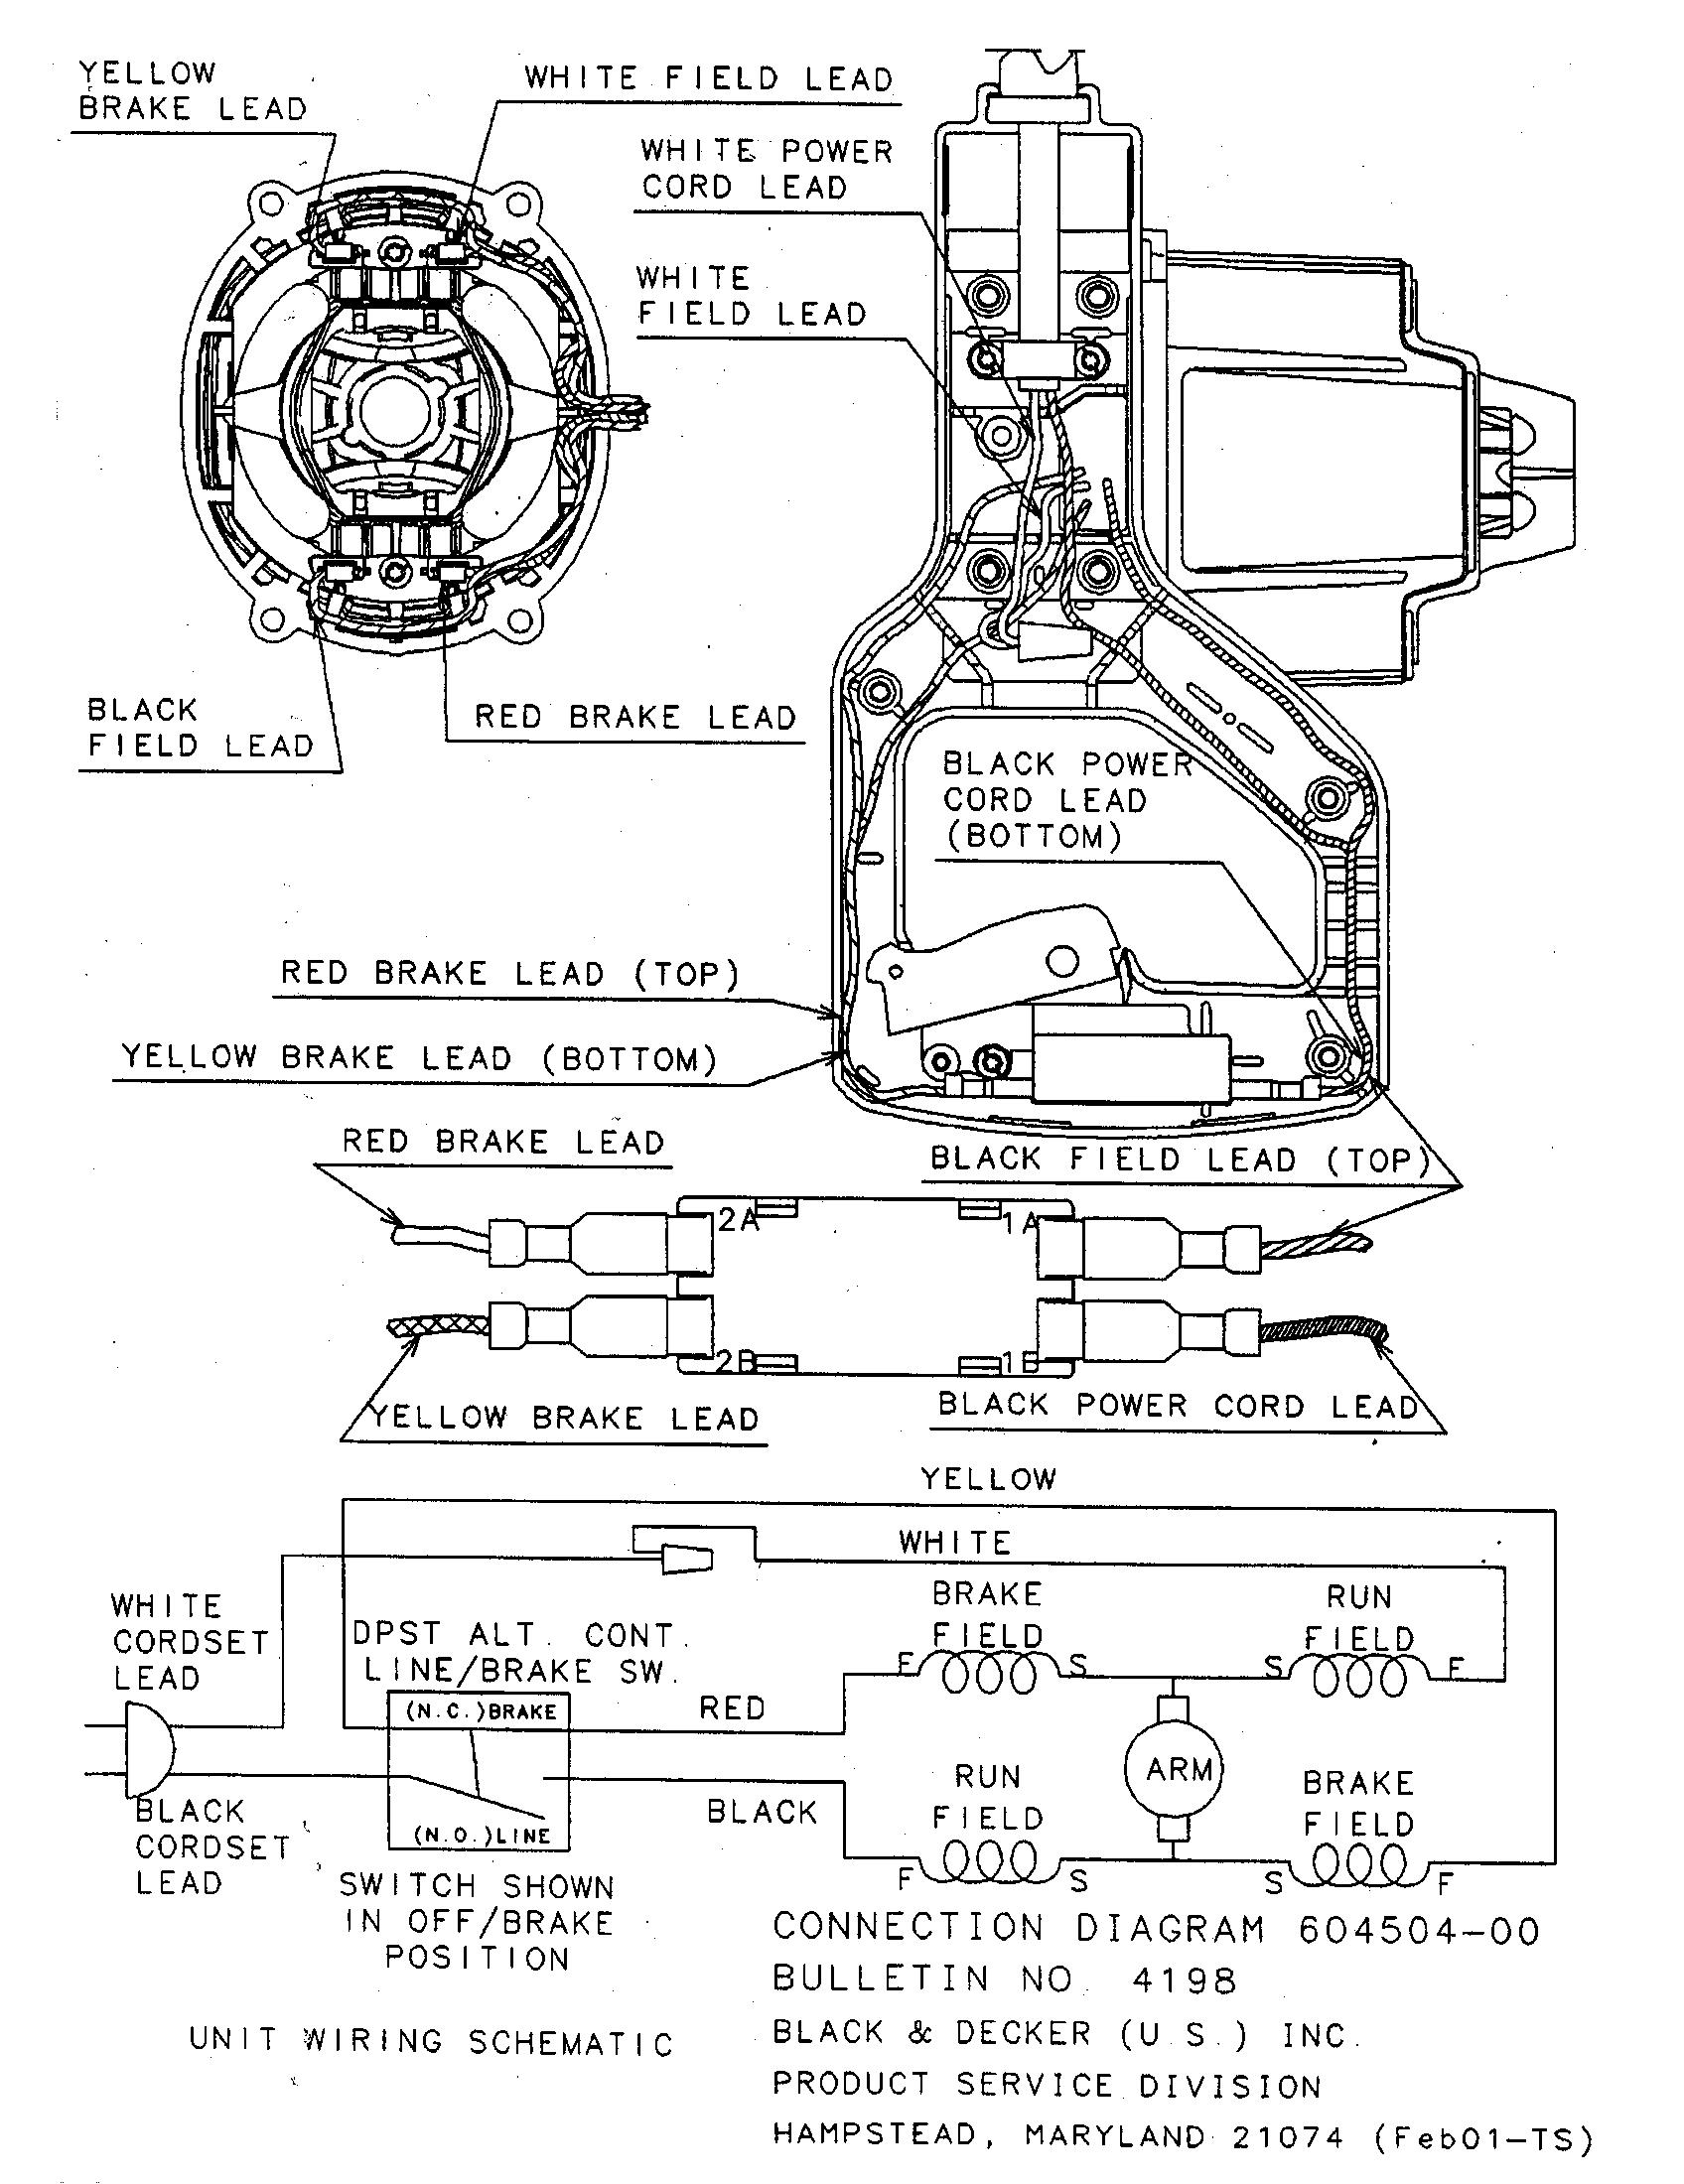 hight resolution of dewalt table saw switch wiring diagram wiring diagram de walt dw744 table saw de walt 744 table saws miter gage